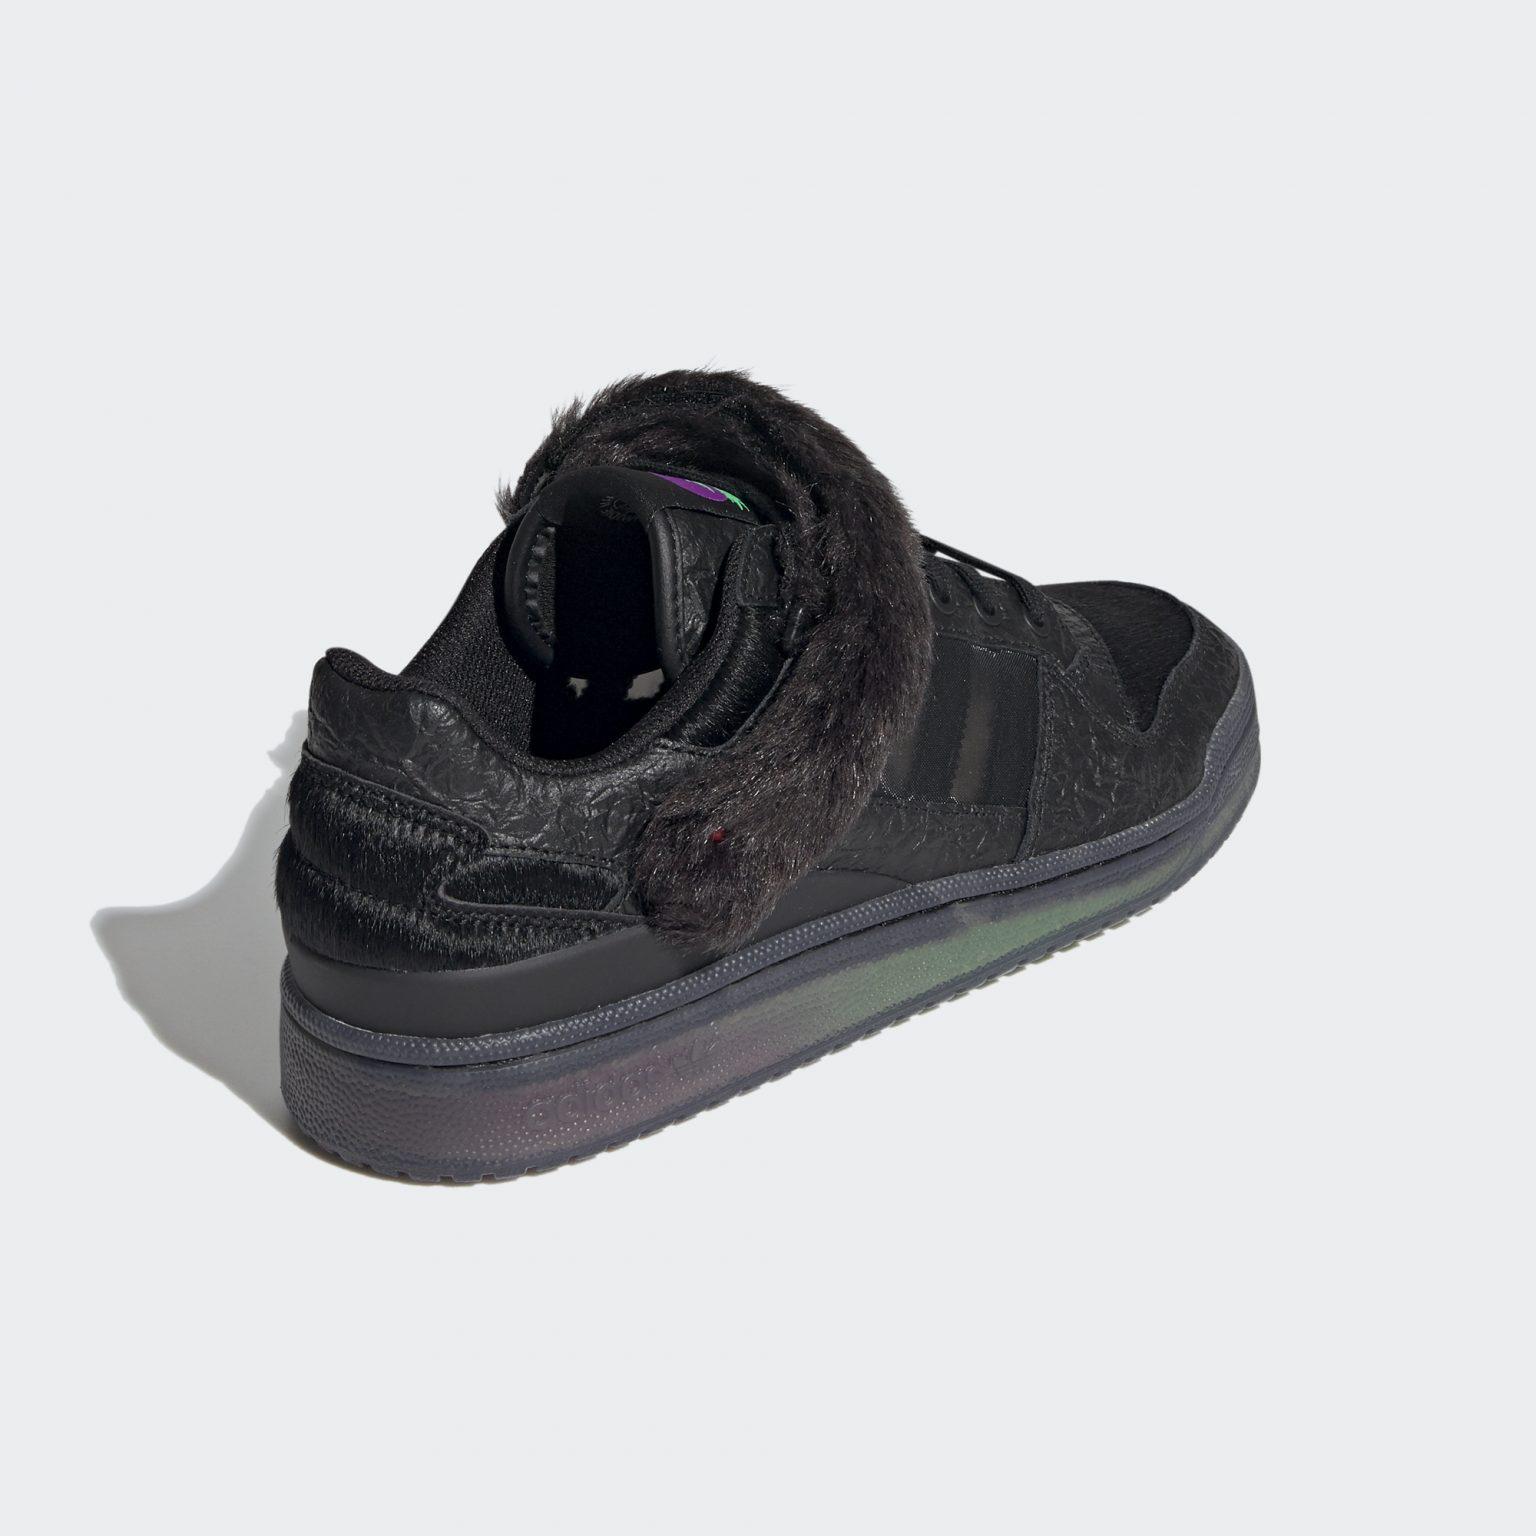 giay the thao hot tu 25-31.10.2020 adidas-halloween-elleman (8)